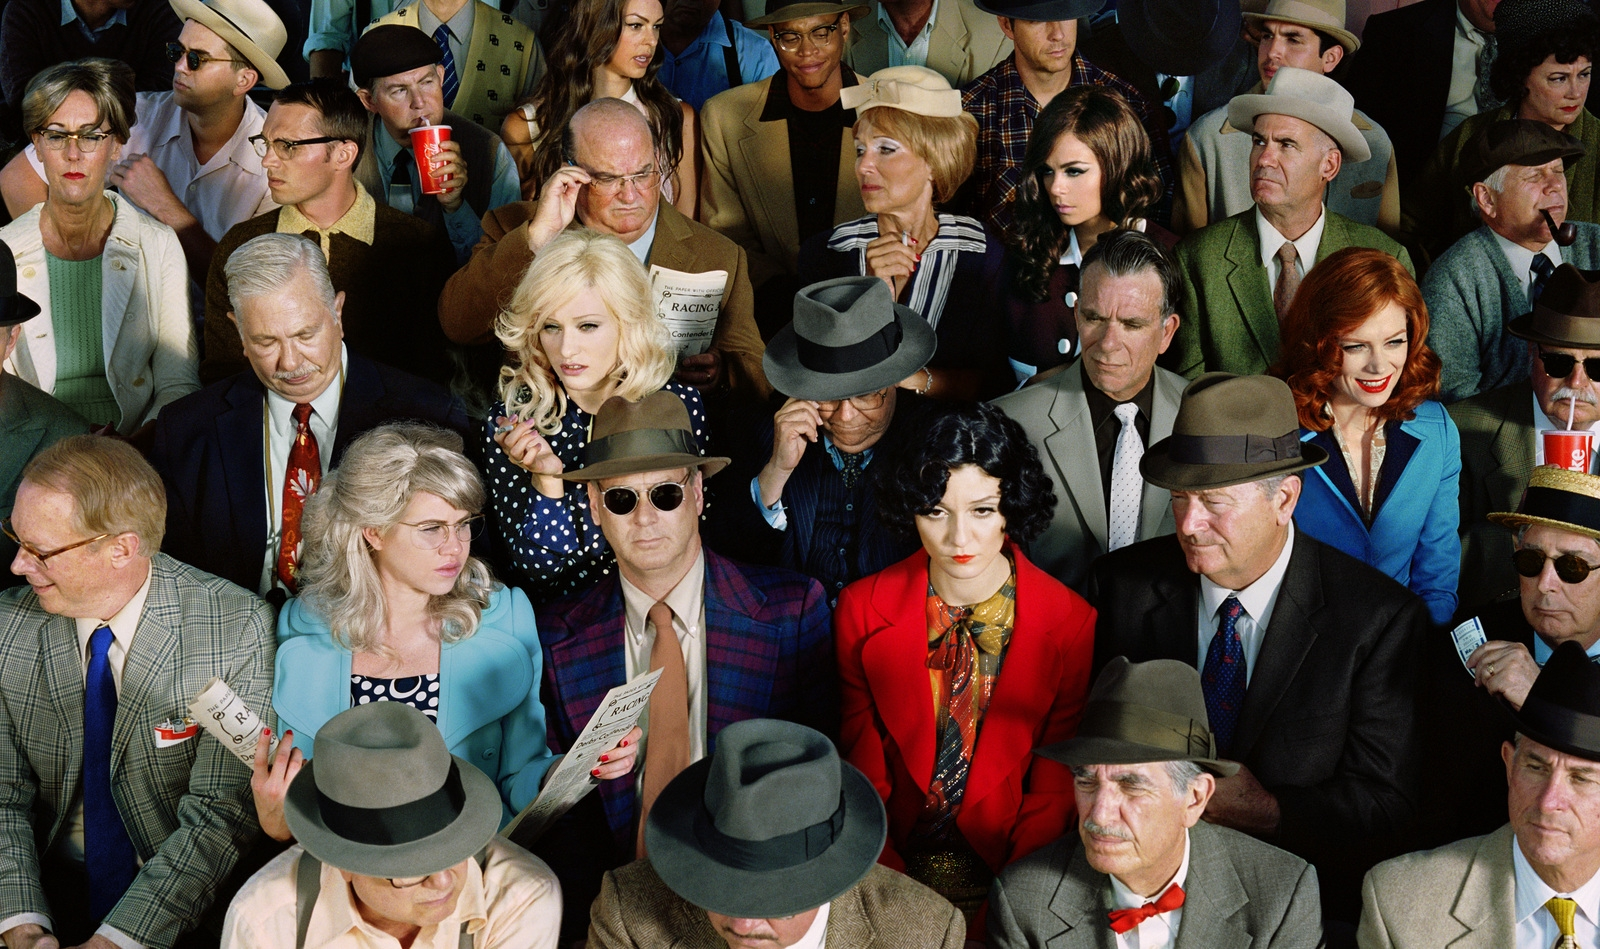 Crowd #1 (Stan Douglas). 2010 image